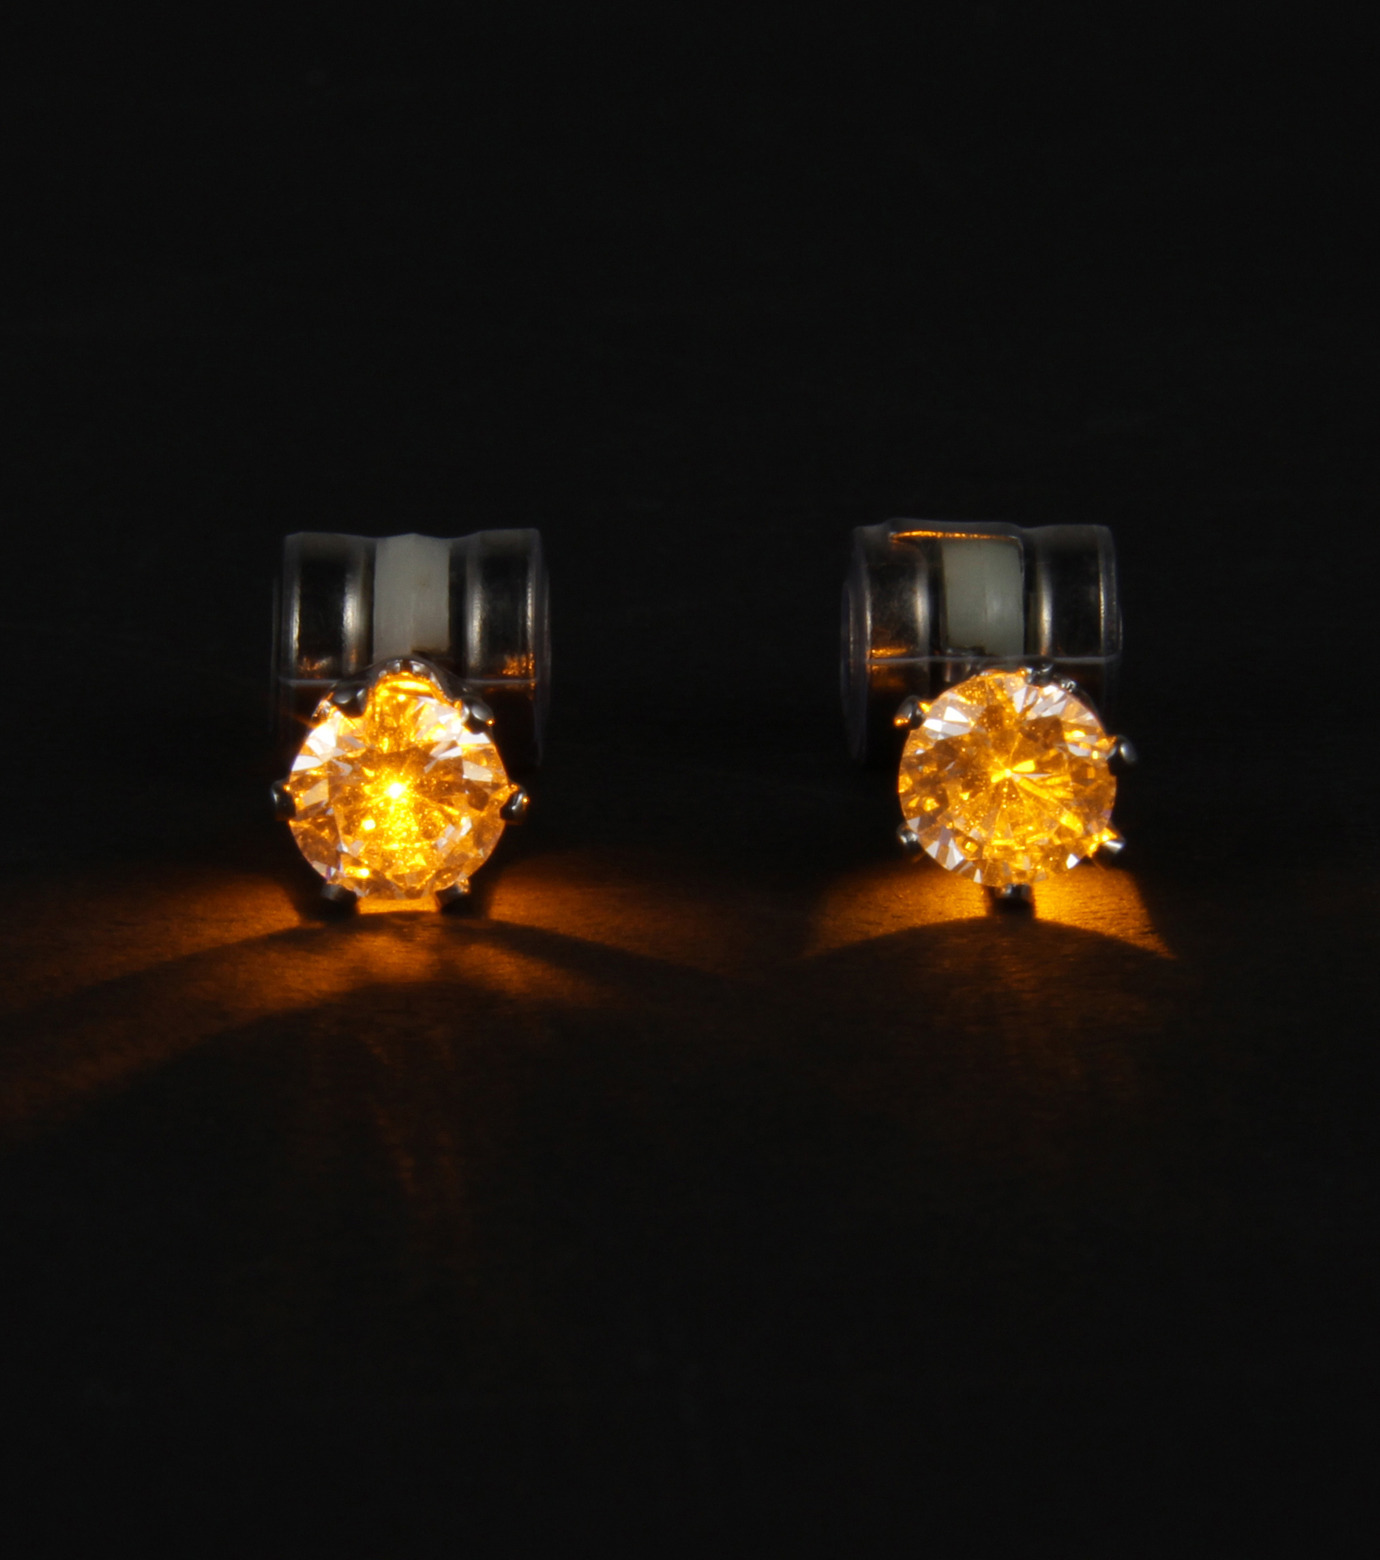 Night Ice(ナイトアイス)のOriginal Yellow-YELLOW(ガジェット/ライト/gadgets/light)-Original-32 拡大詳細画像3